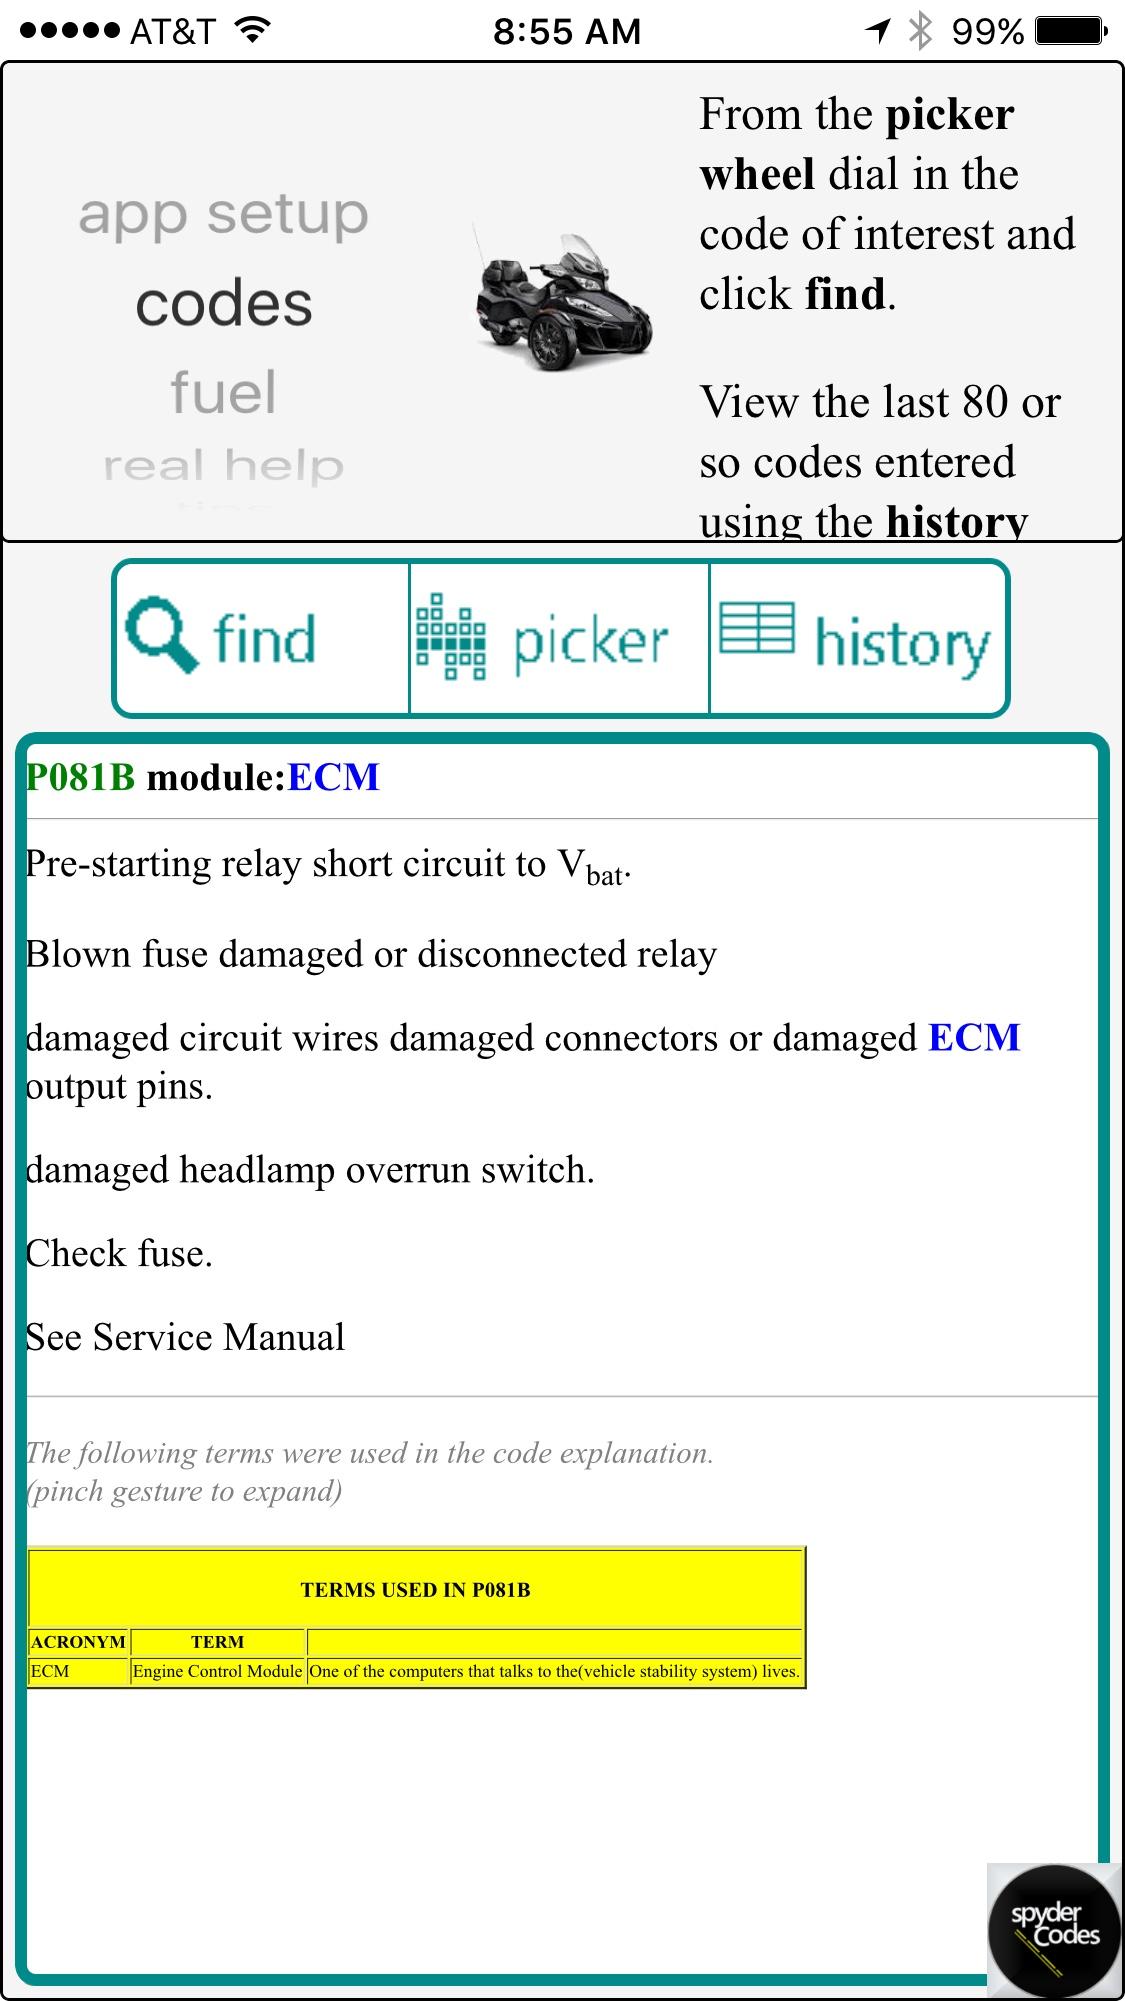 P081b Code Please Help Kawasaki Voyager Ipod Wiring Diagram 2010 Vulcan 2014 Suzuki V Strom 650